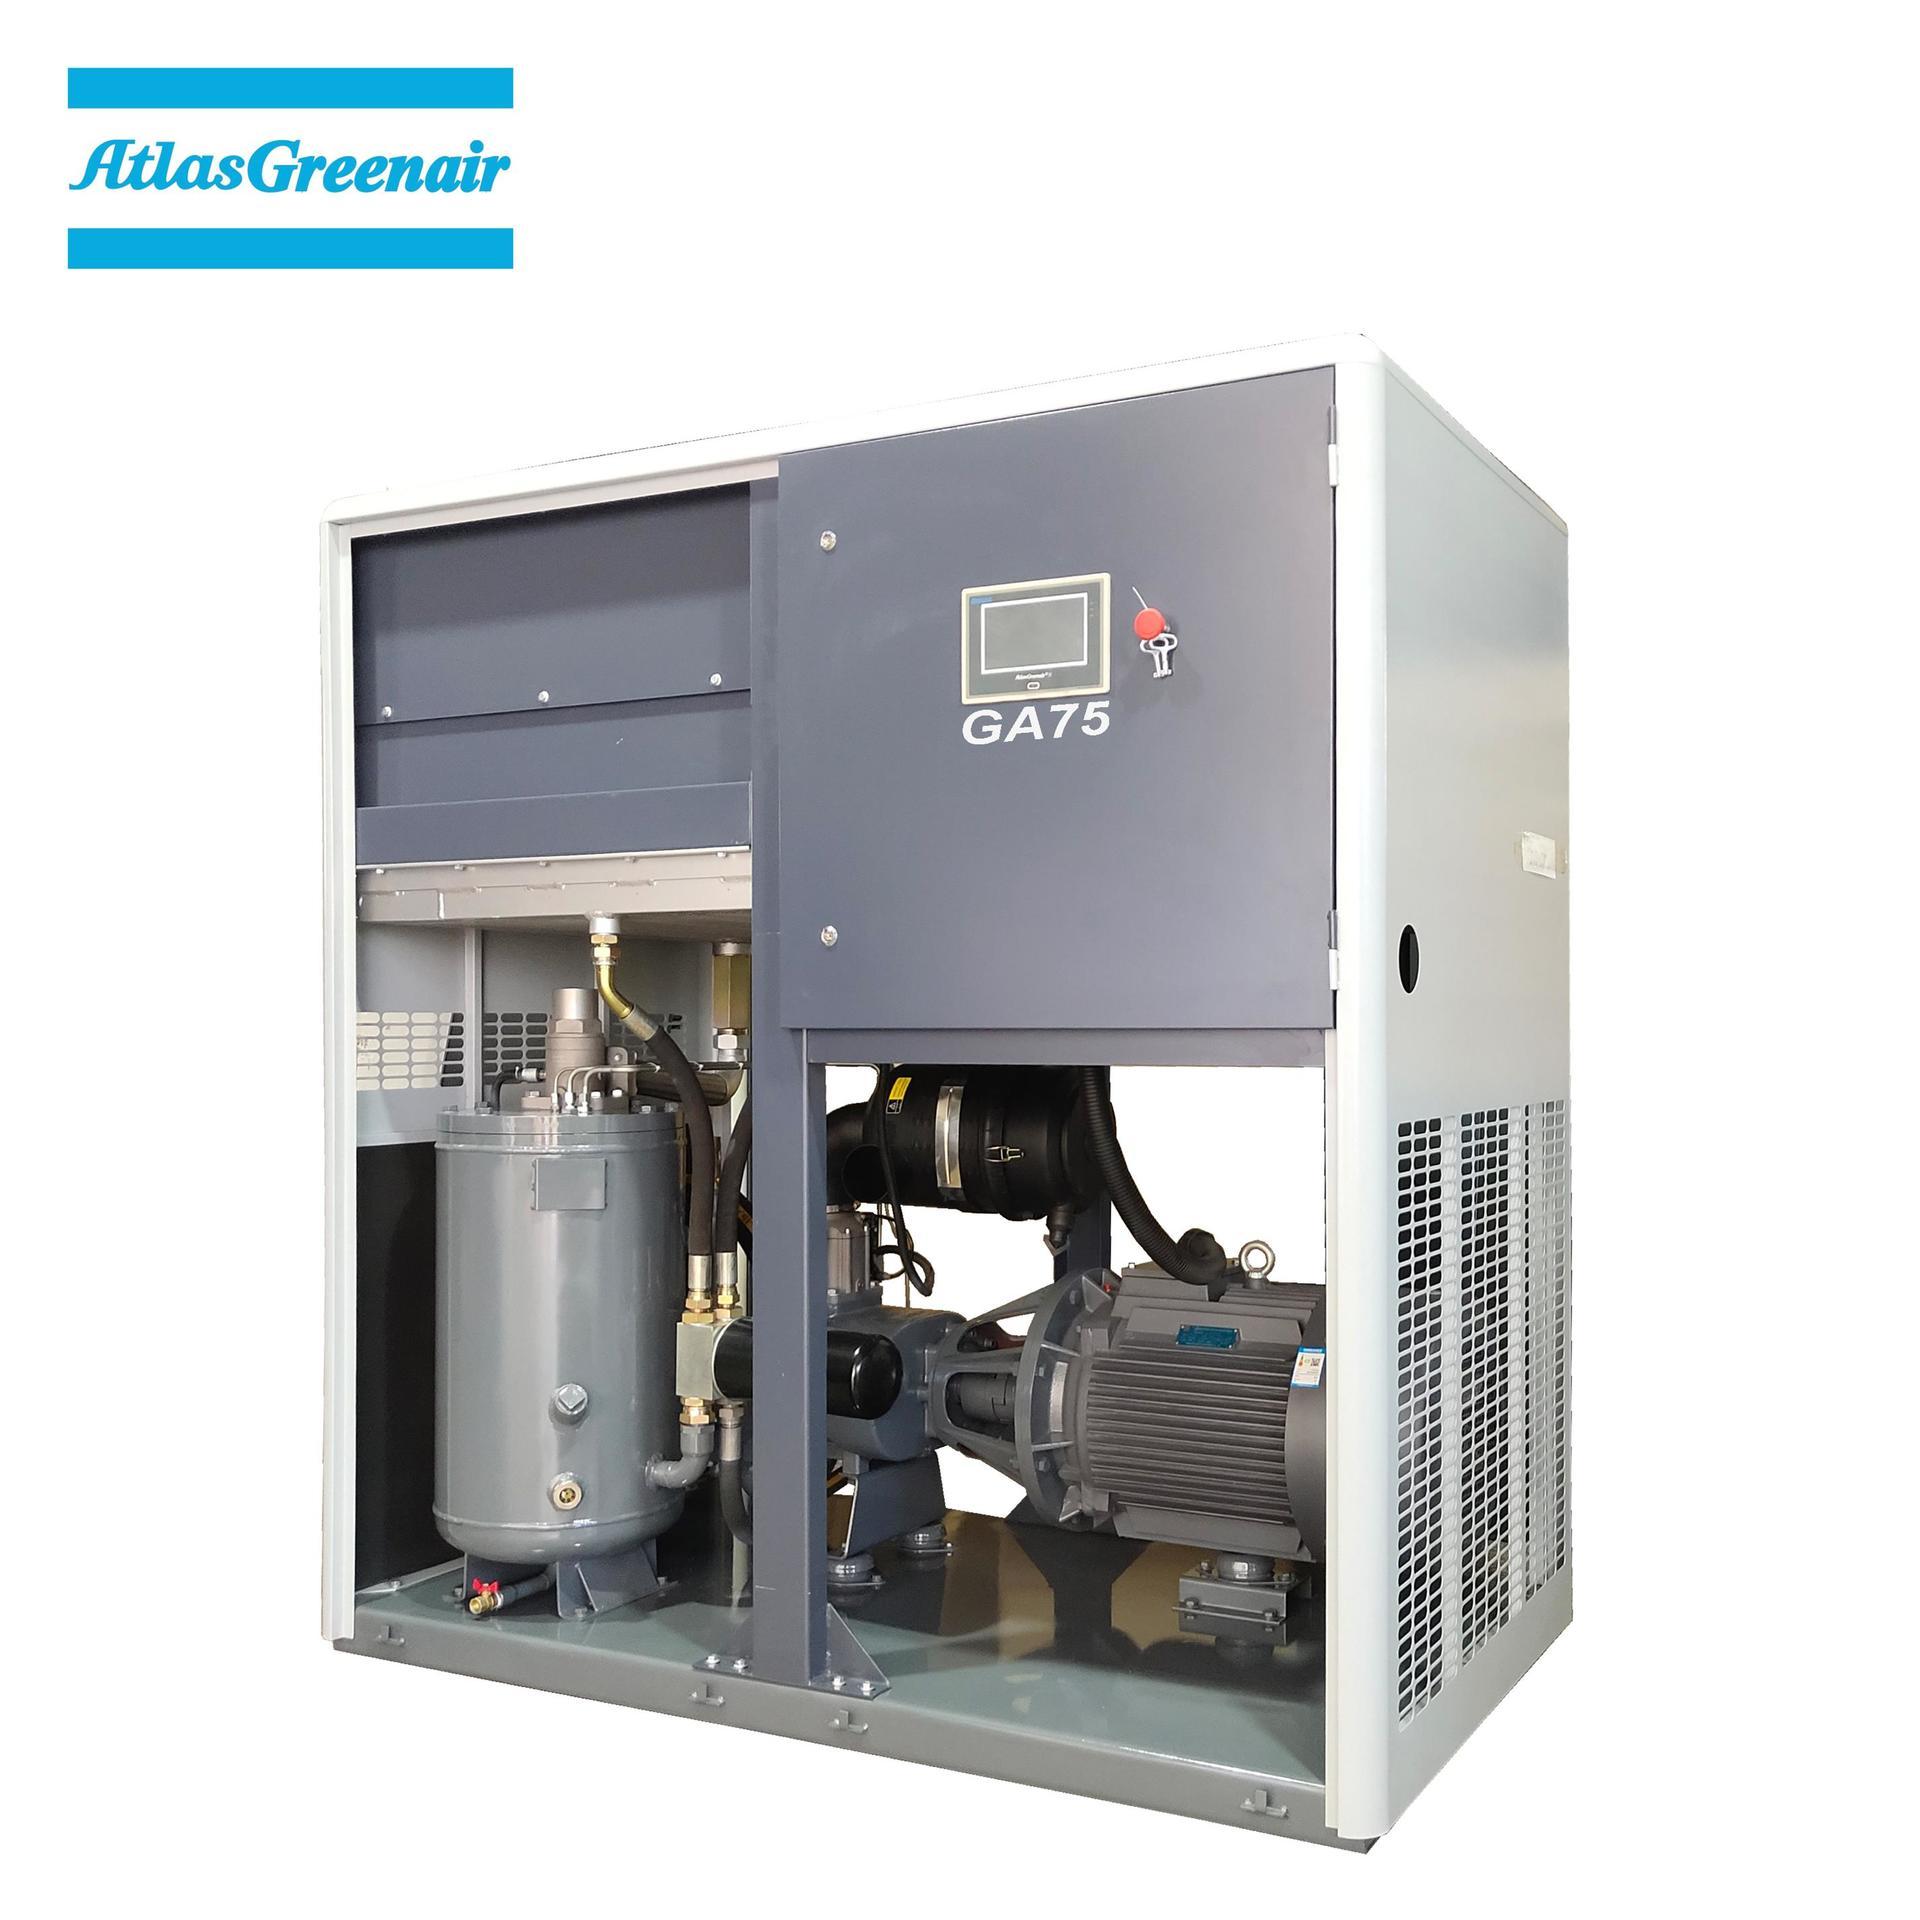 Greenair Atlas GA75 Industrial Rotary Screw Air Compressor